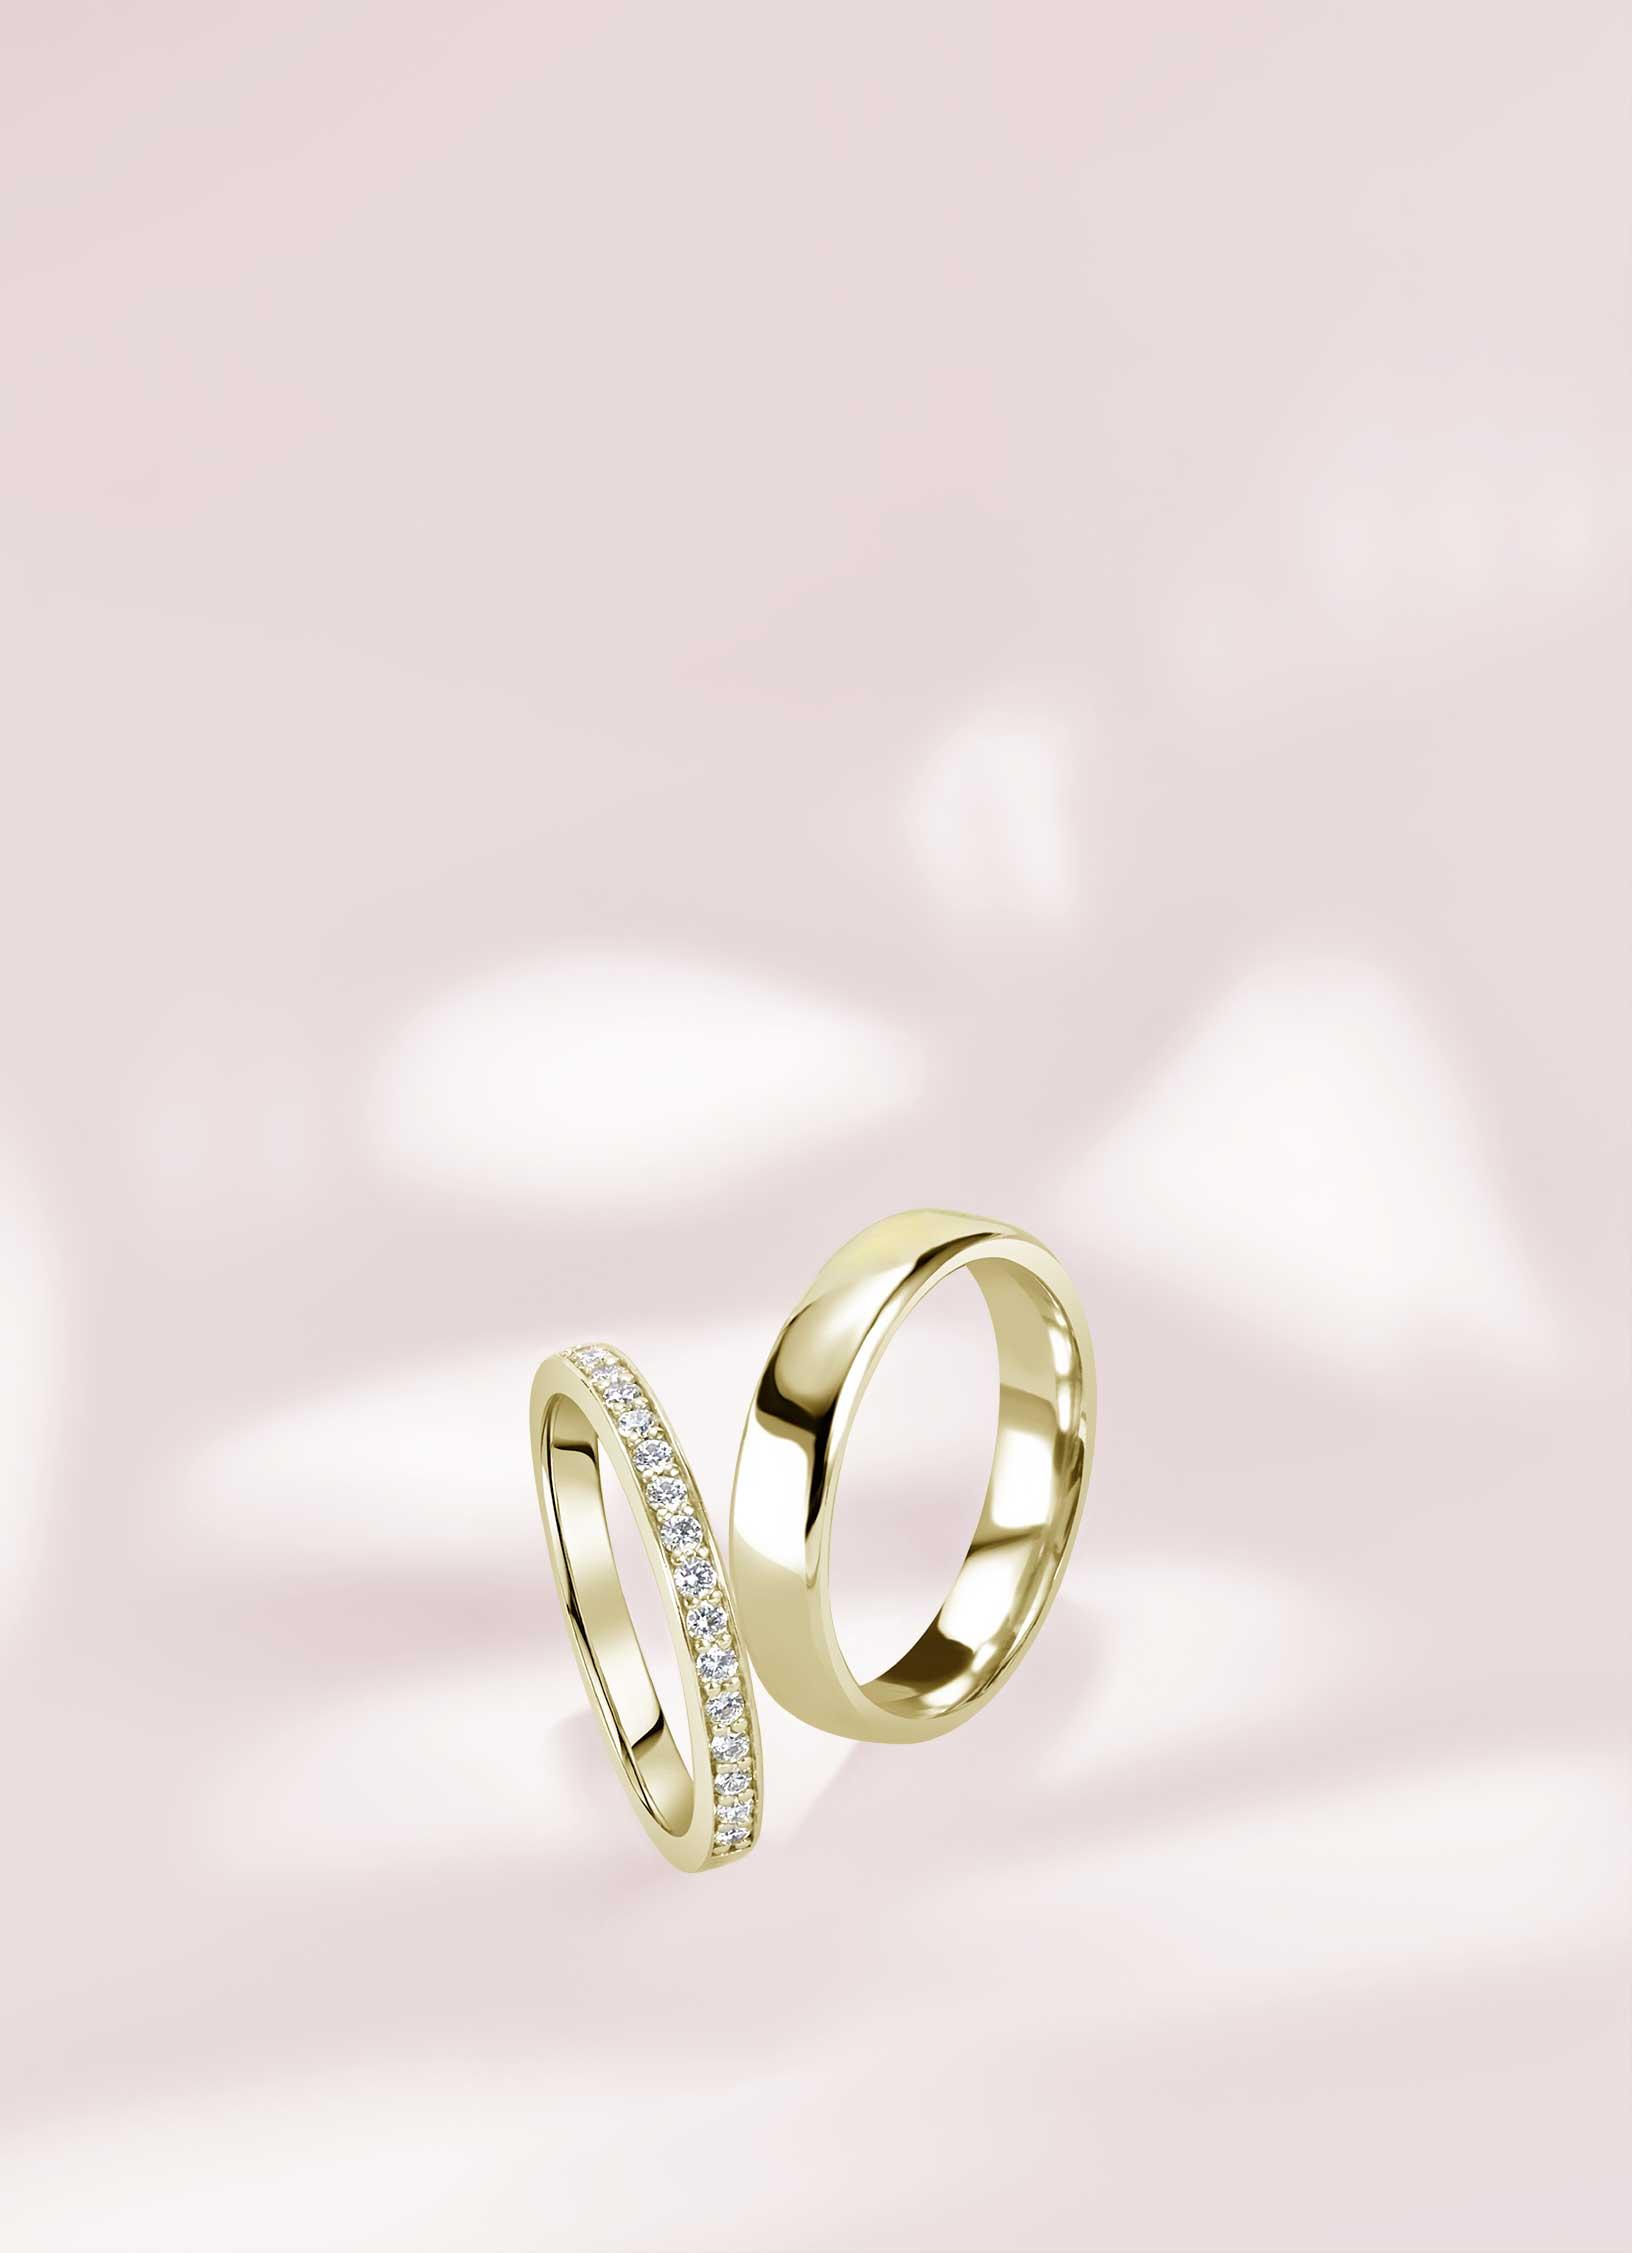 Yellow Gold Wedding Rings - Steven Stone